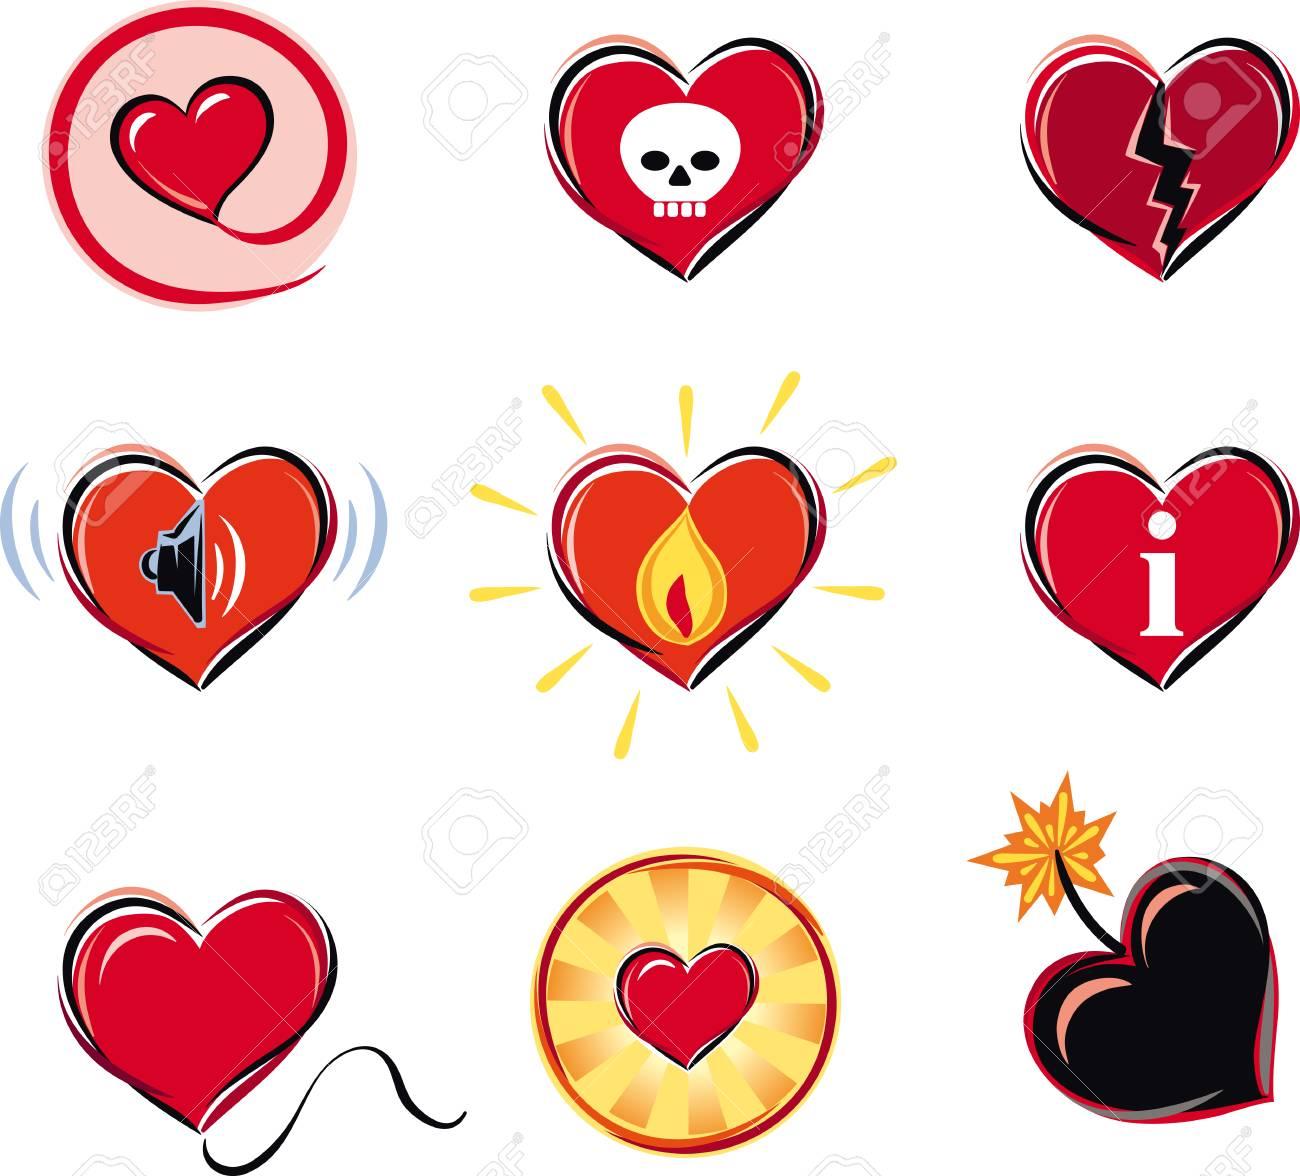 Series Of Heart Shaped Symbols Royalty Free Cliparts Vectors And